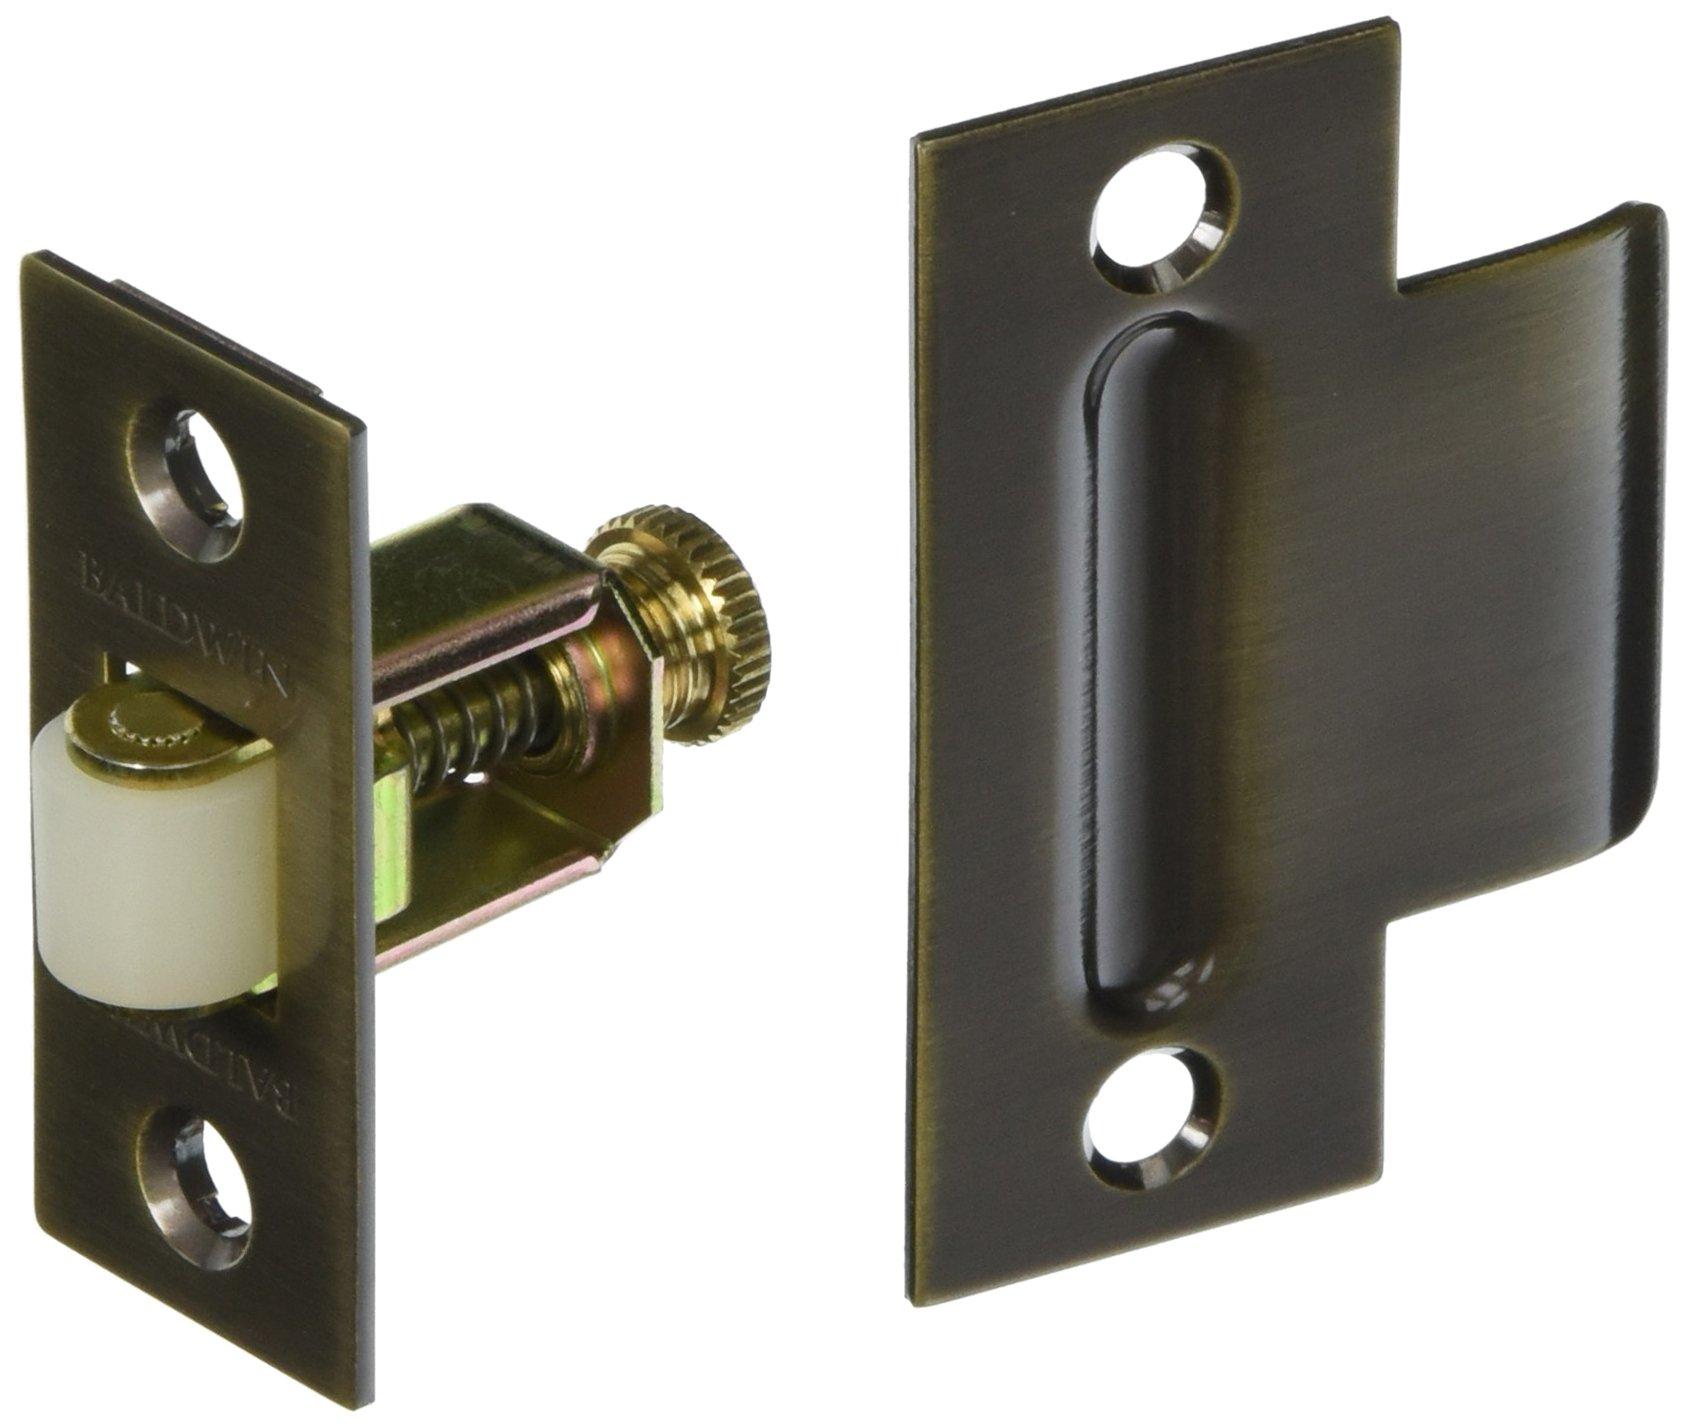 Baldwin 0440050 Adjustable Roller Catch, Antique Brass